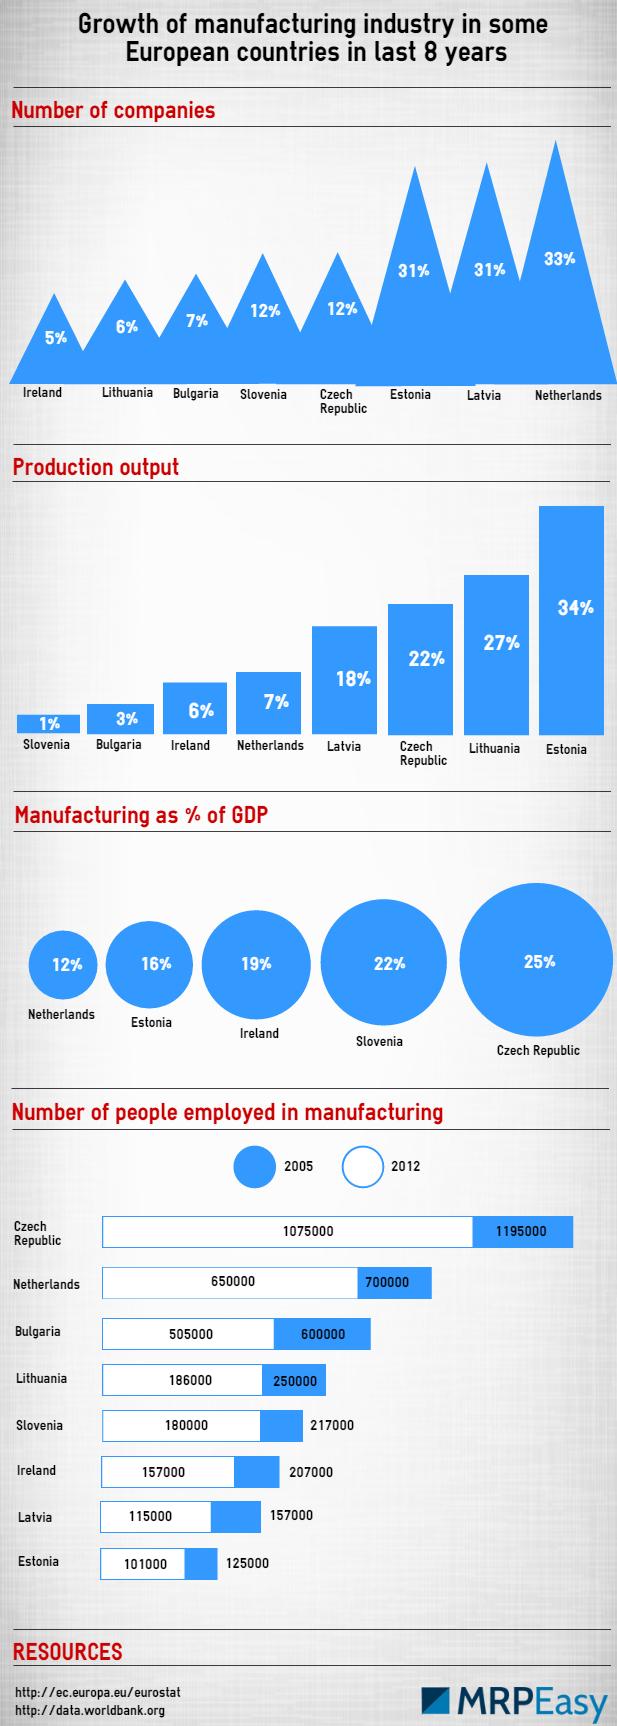 MRPEasy-European_manufacturing_8_years